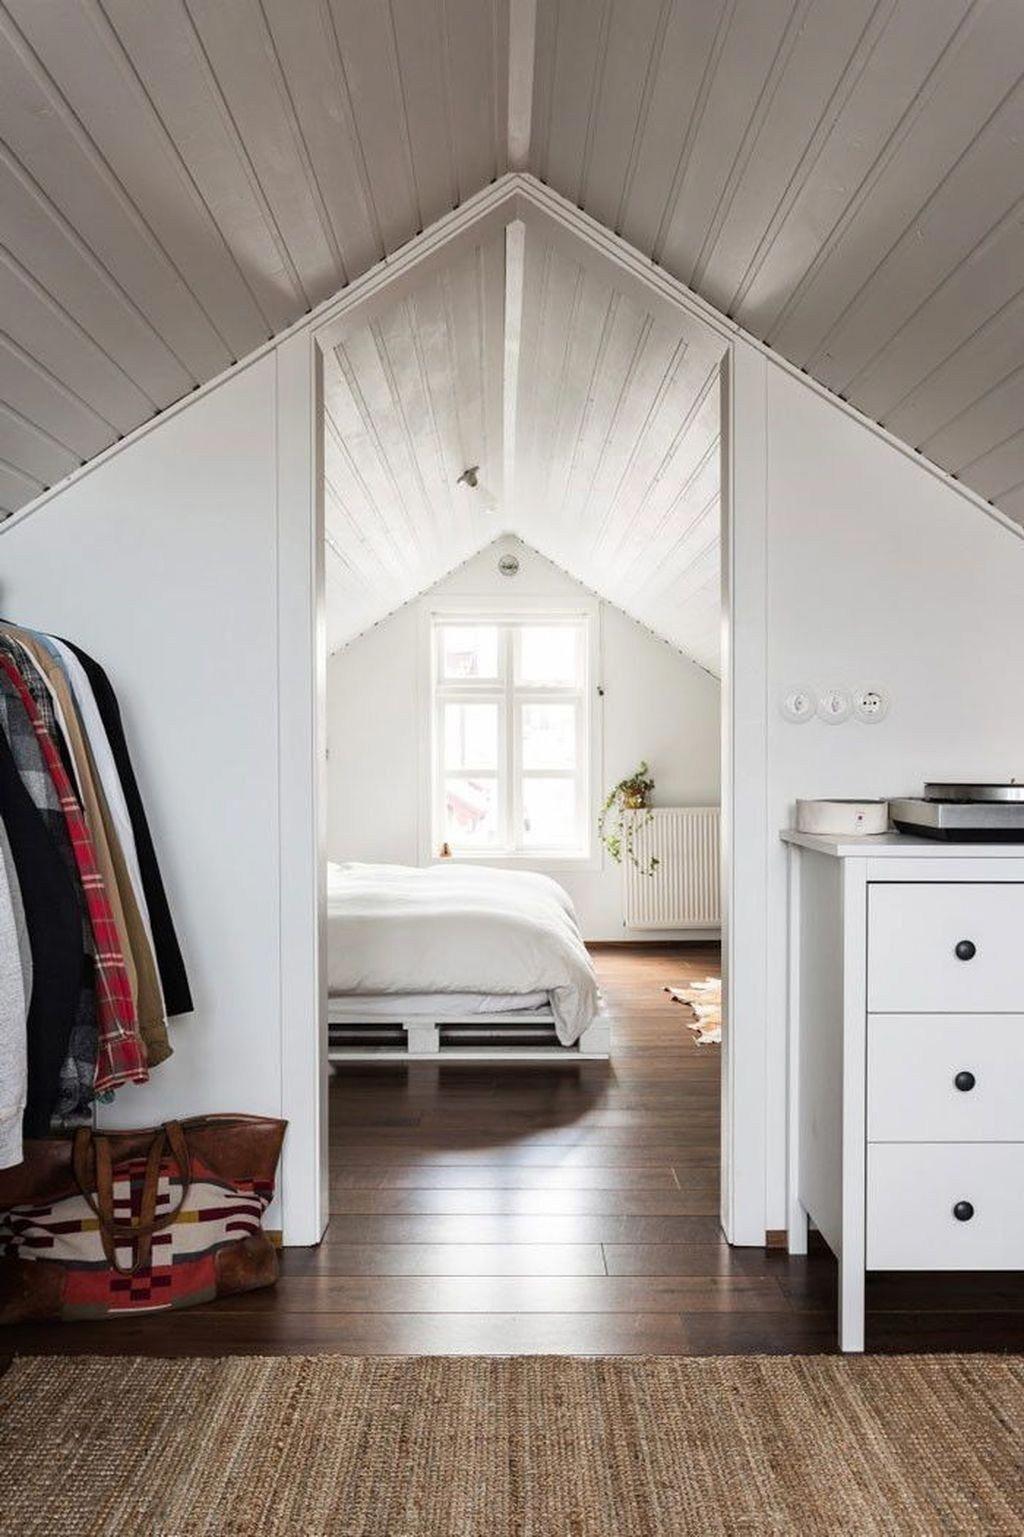 Attic Drawing Atticrenovationapartmenttherapy Atticbathroomscandinavian Dachzimmer Dachboden Loft Dachboden Schlafzimmer Ideen